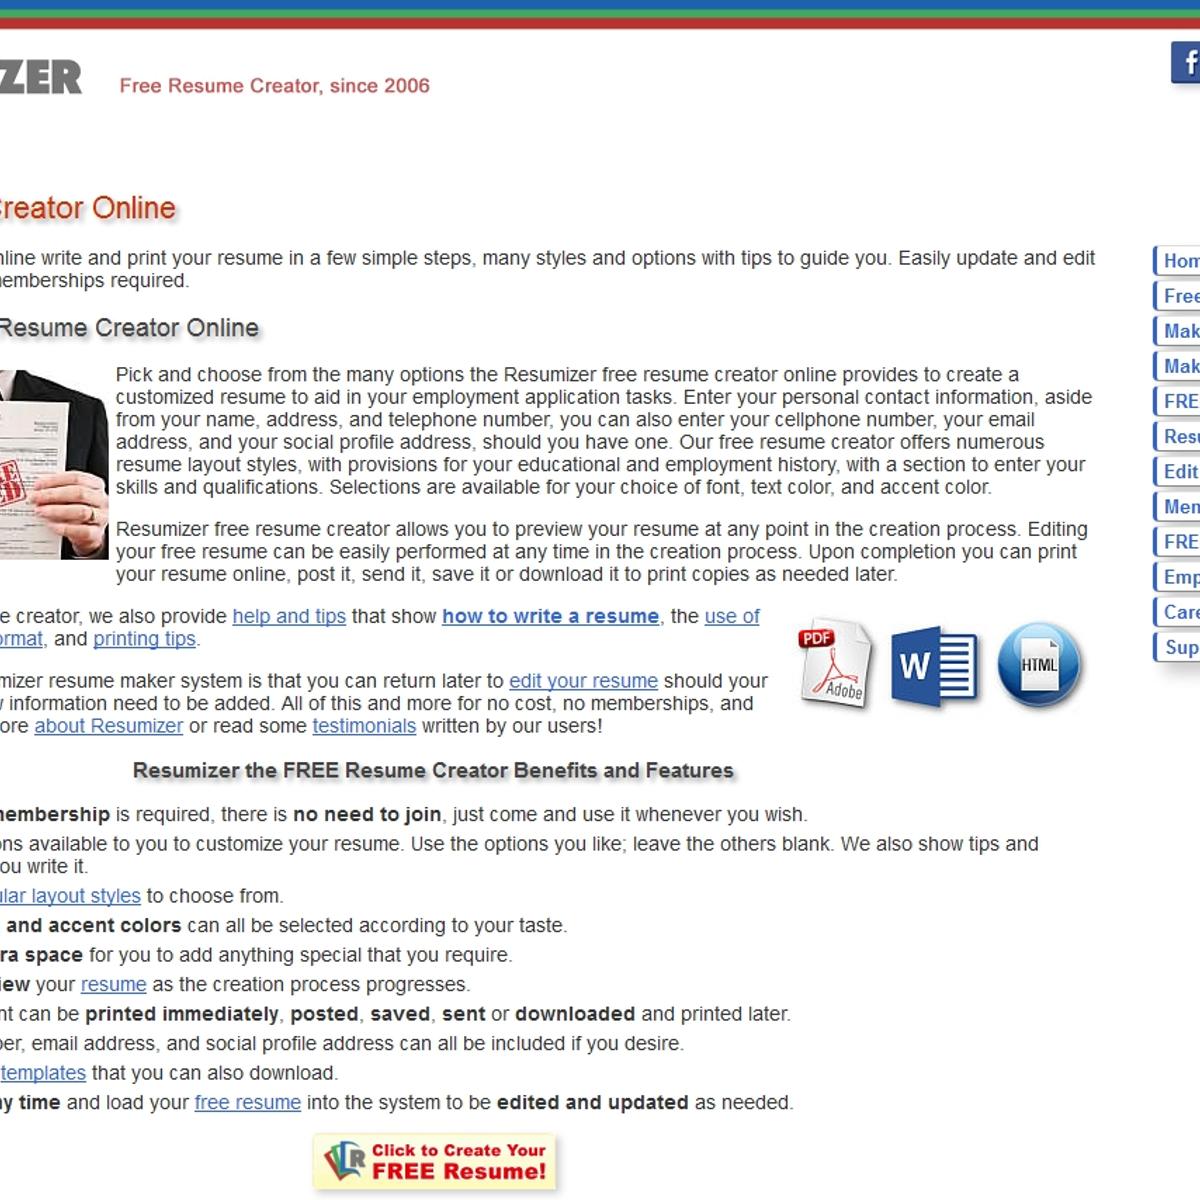 Resumizer Free Resume Creator Alternatives And Similar Websites And